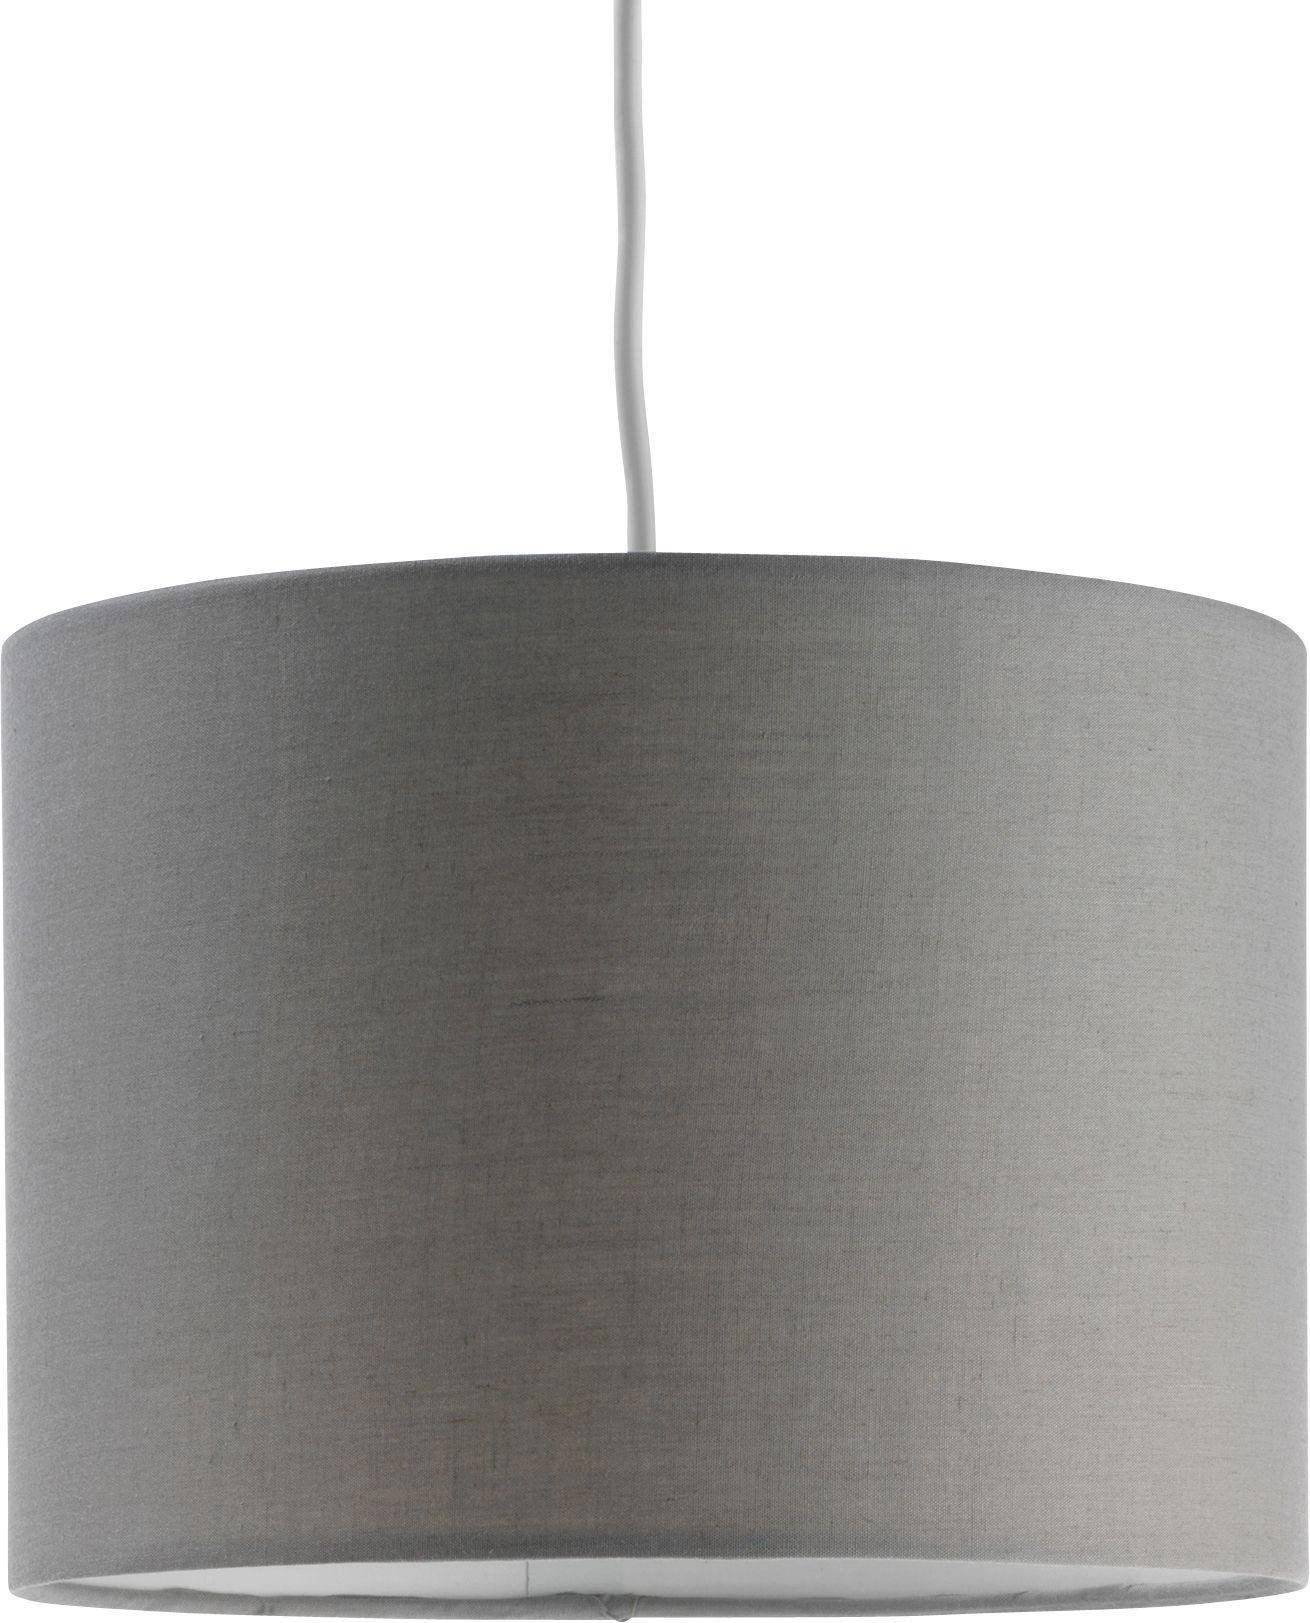 argos home flint grey drum shade 9142031 argos price. Black Bedroom Furniture Sets. Home Design Ideas